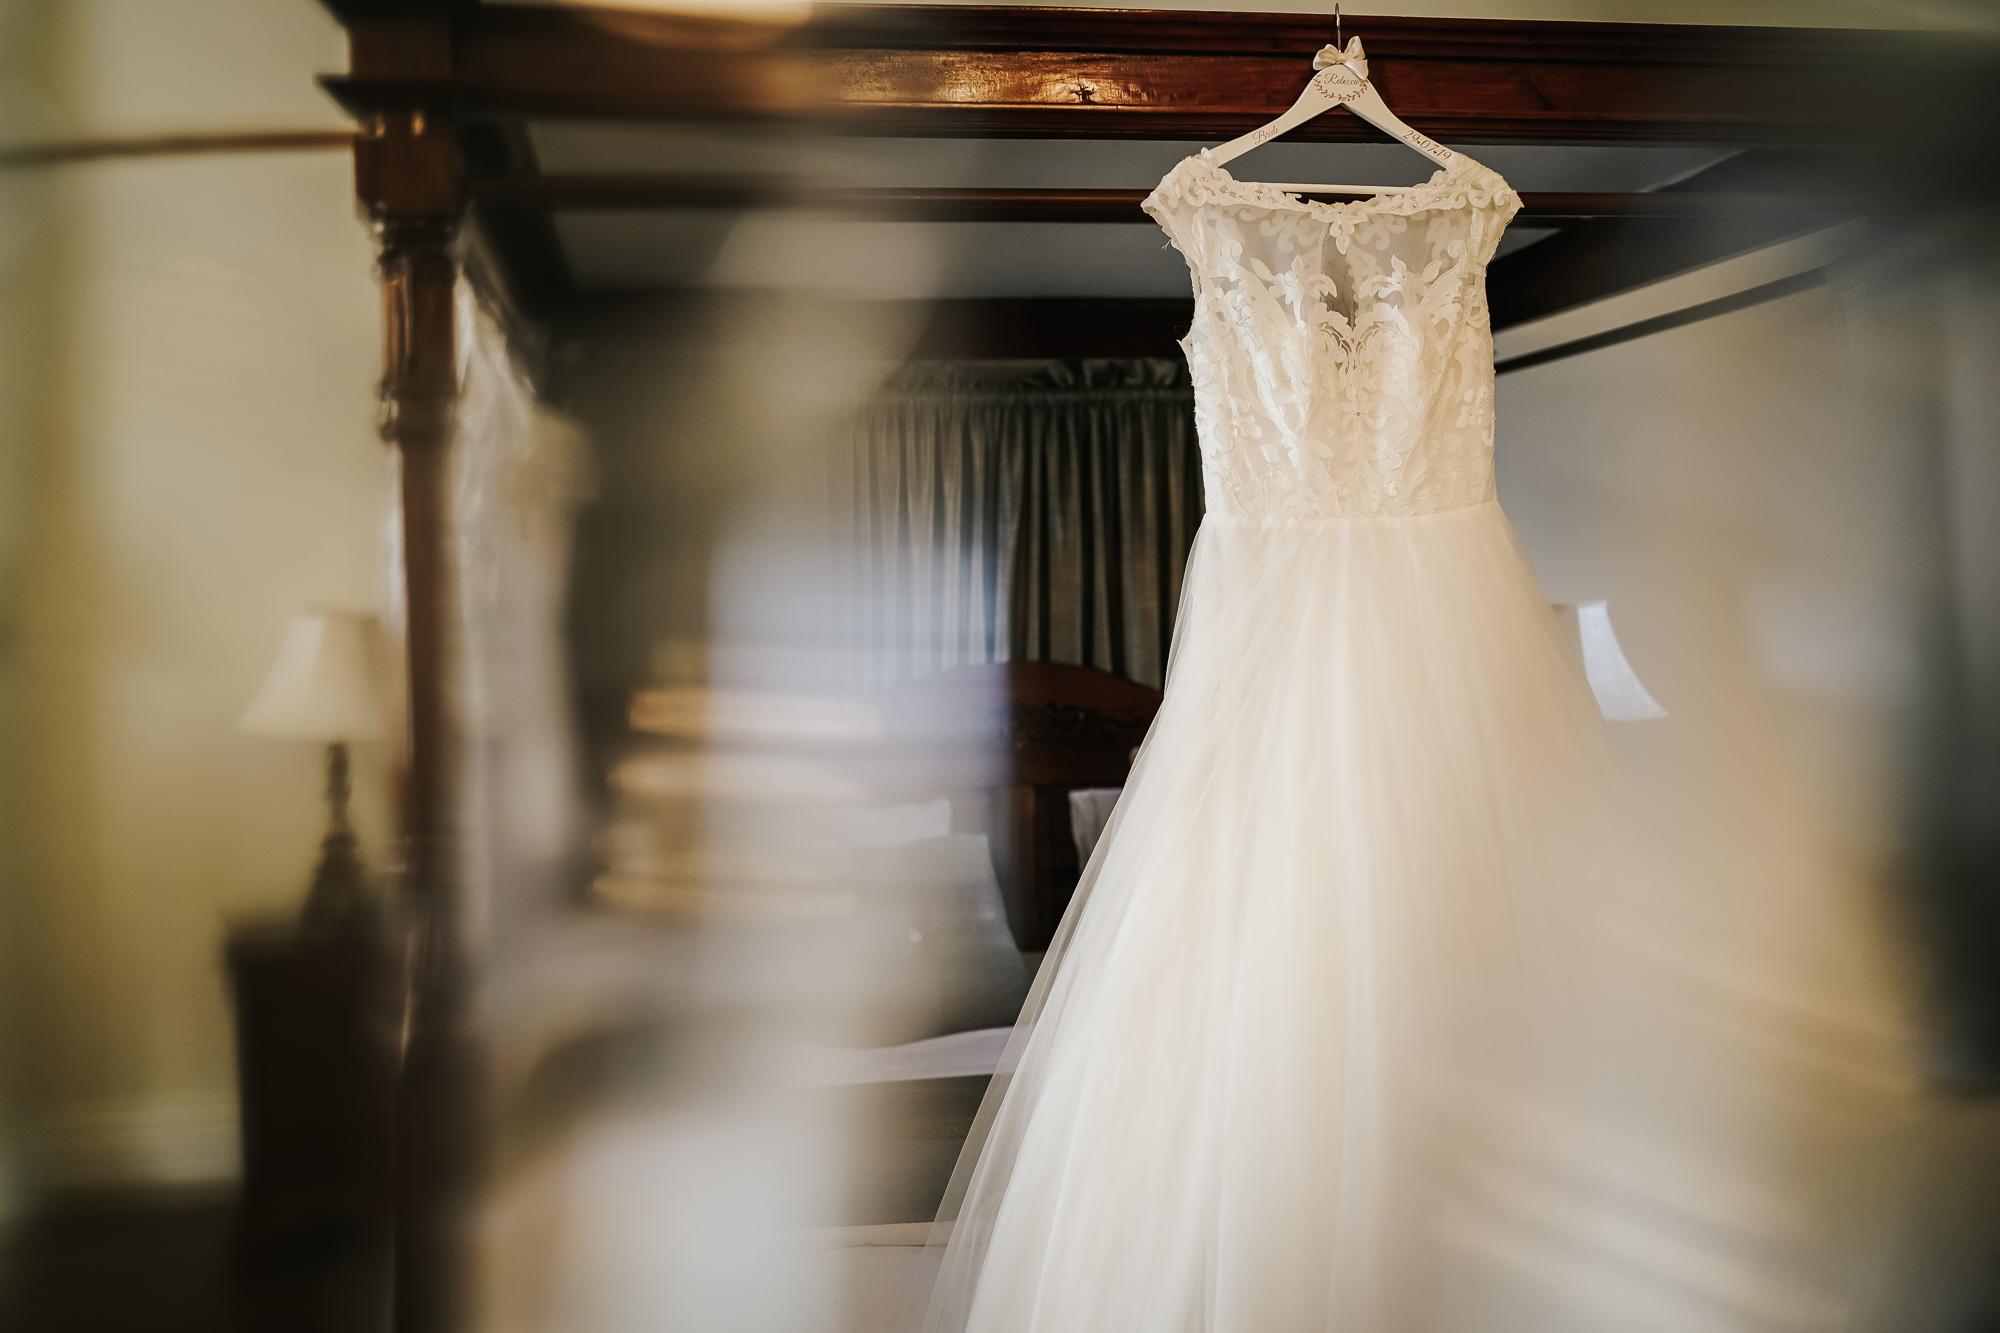 West Tower Wedding Photographer Ormskirk Lancashire wedding photography (8 of 57).jpg